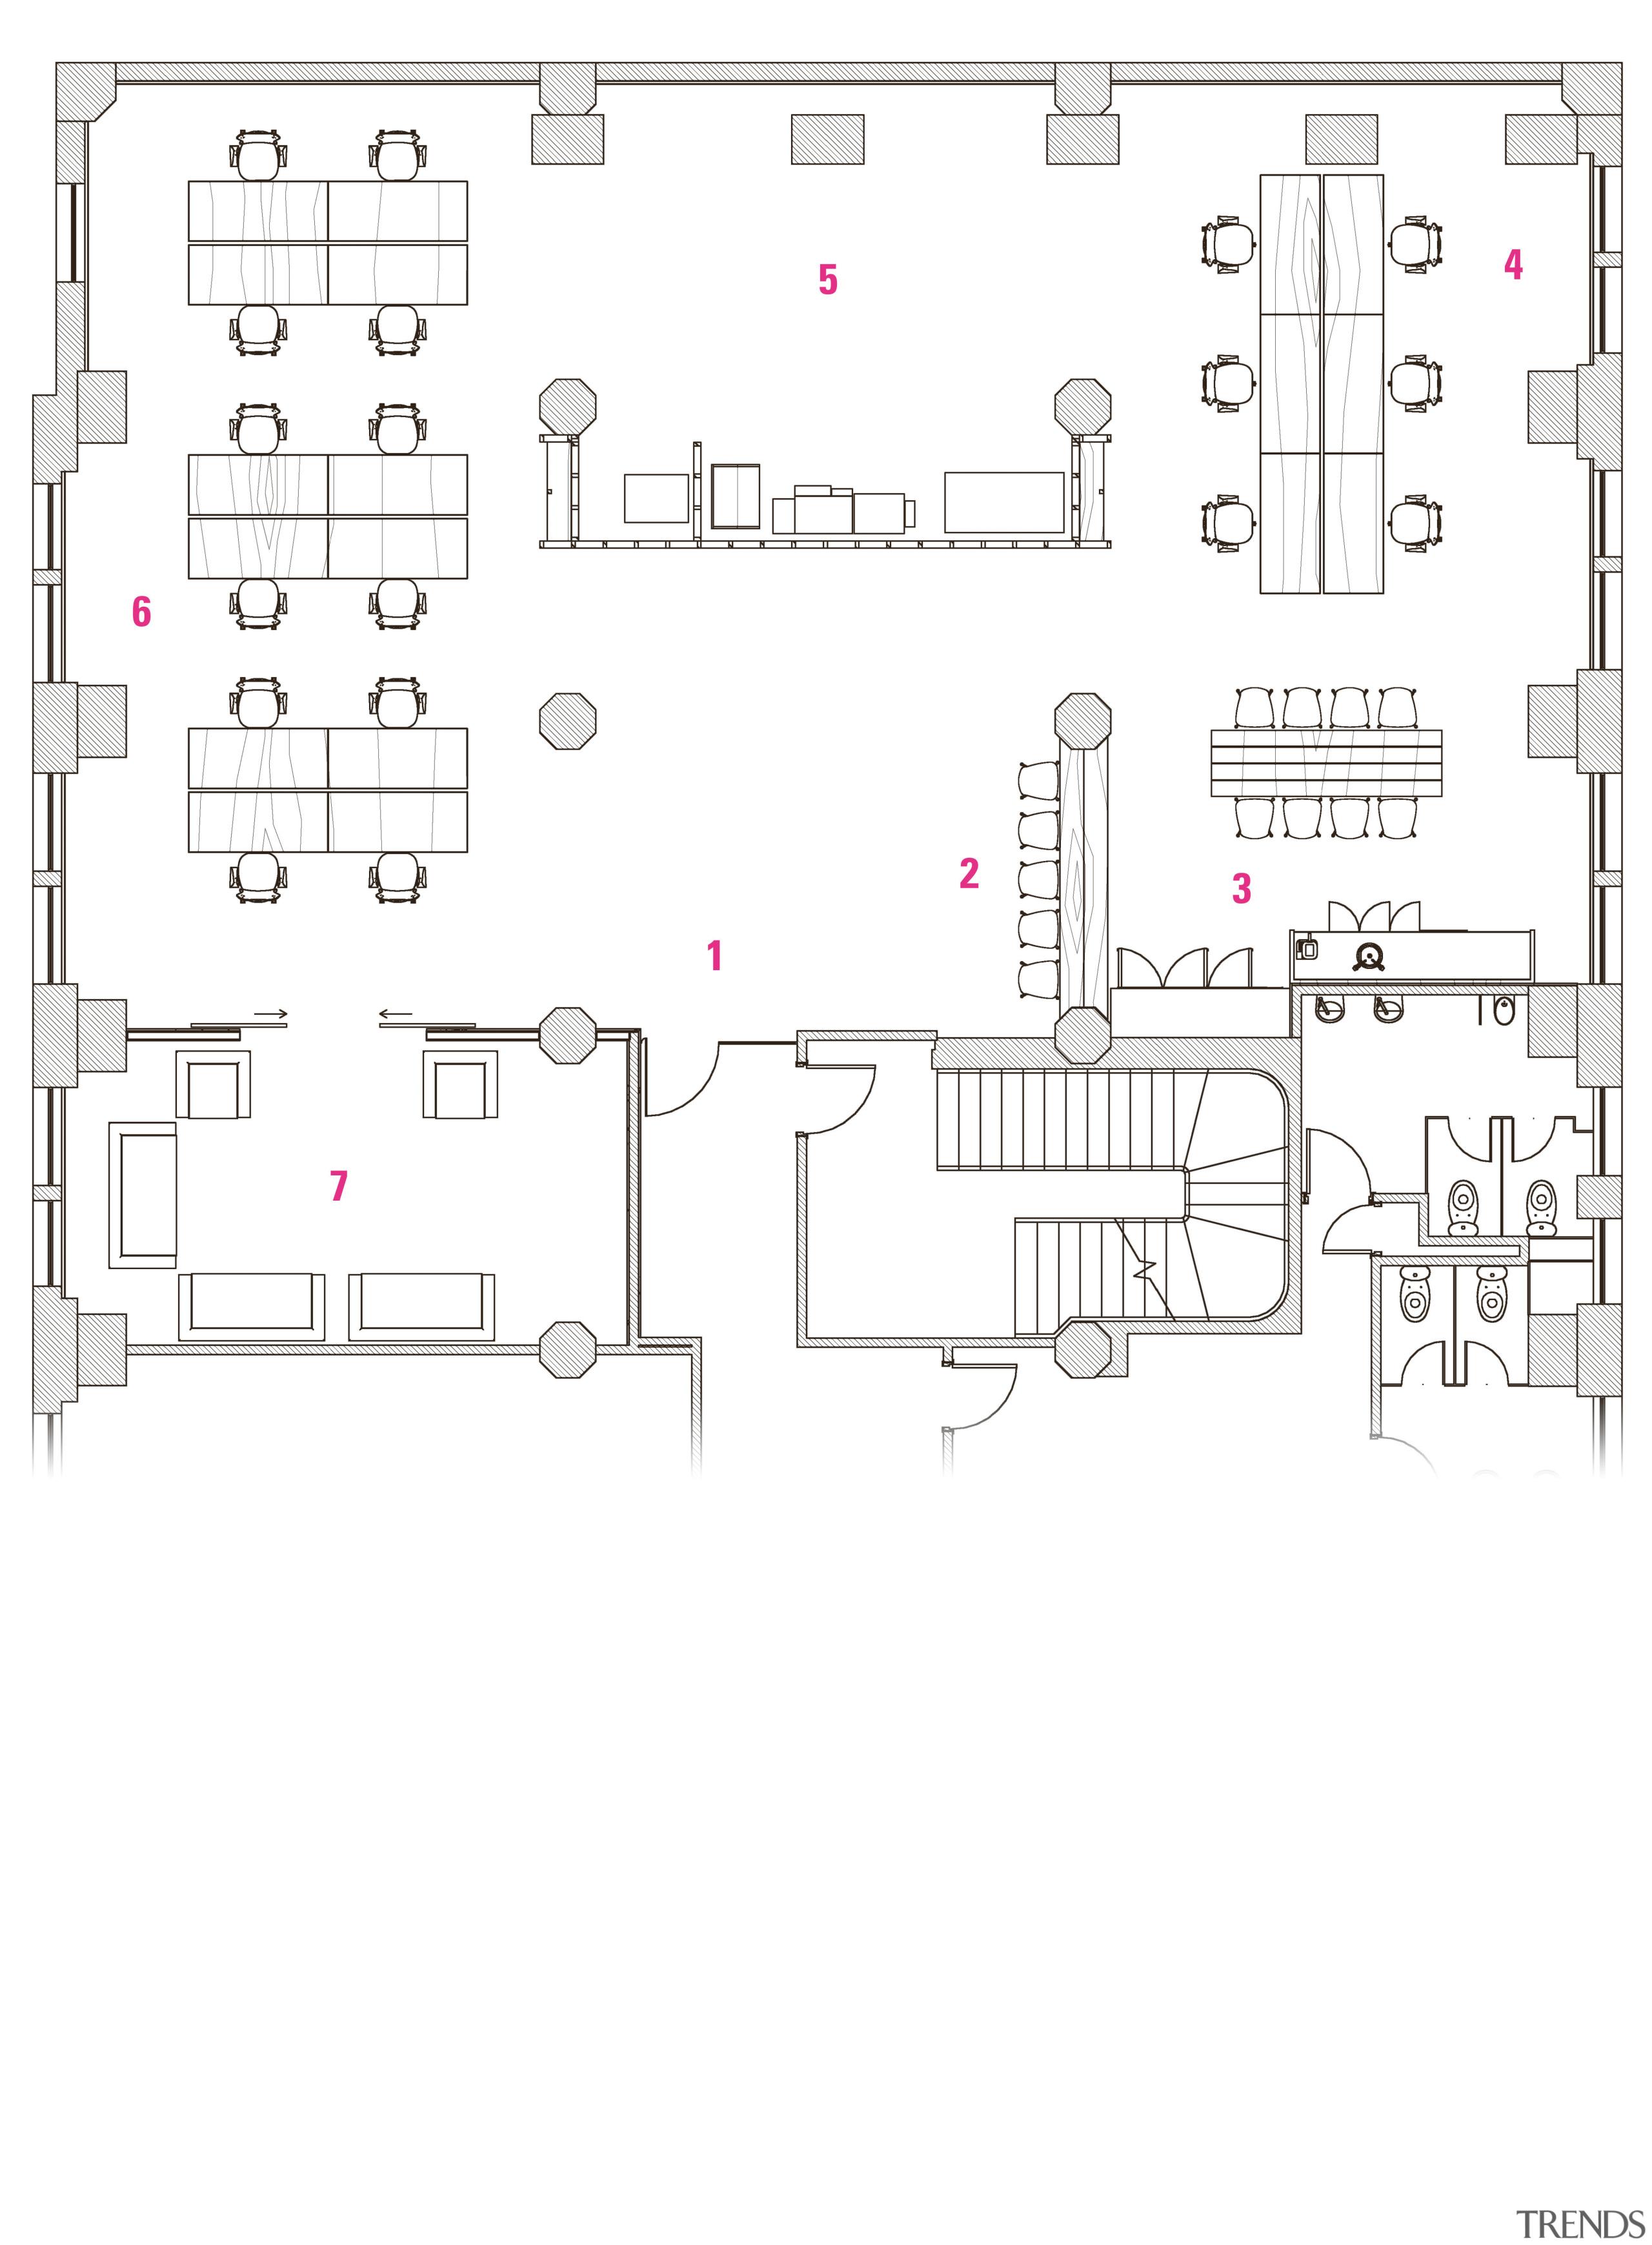 Legend 1 entry, 2 informal reception, 3 kitchen area, design, diagram, drawing, floor plan, font, line, plan, product, product design, text, white